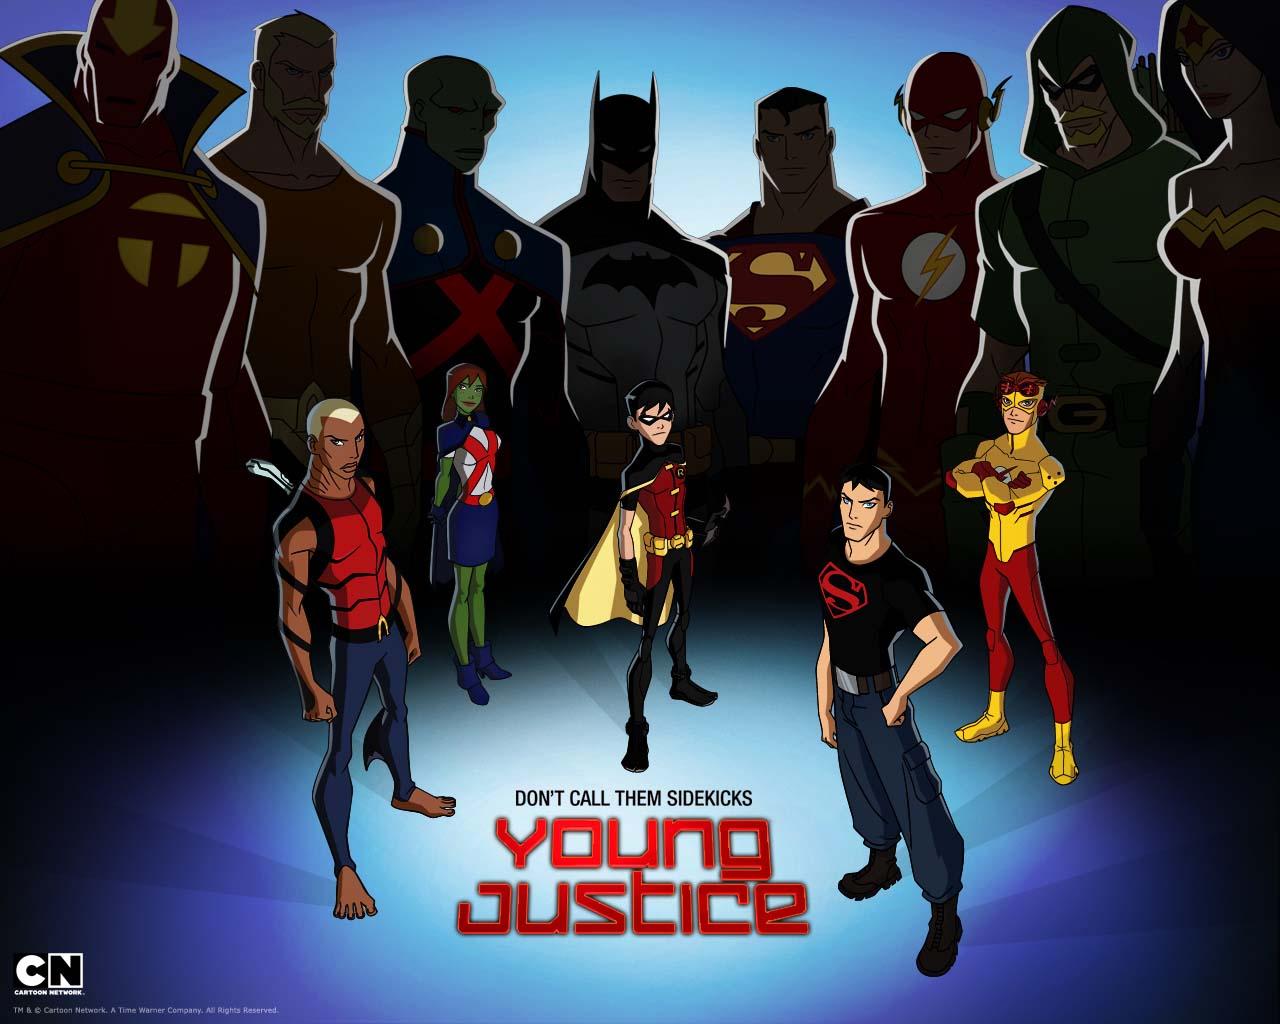 YOUNG JUSTICE WALLPAPERS JUSTICIA JOVEN VIZIO BLOG 1280x1024